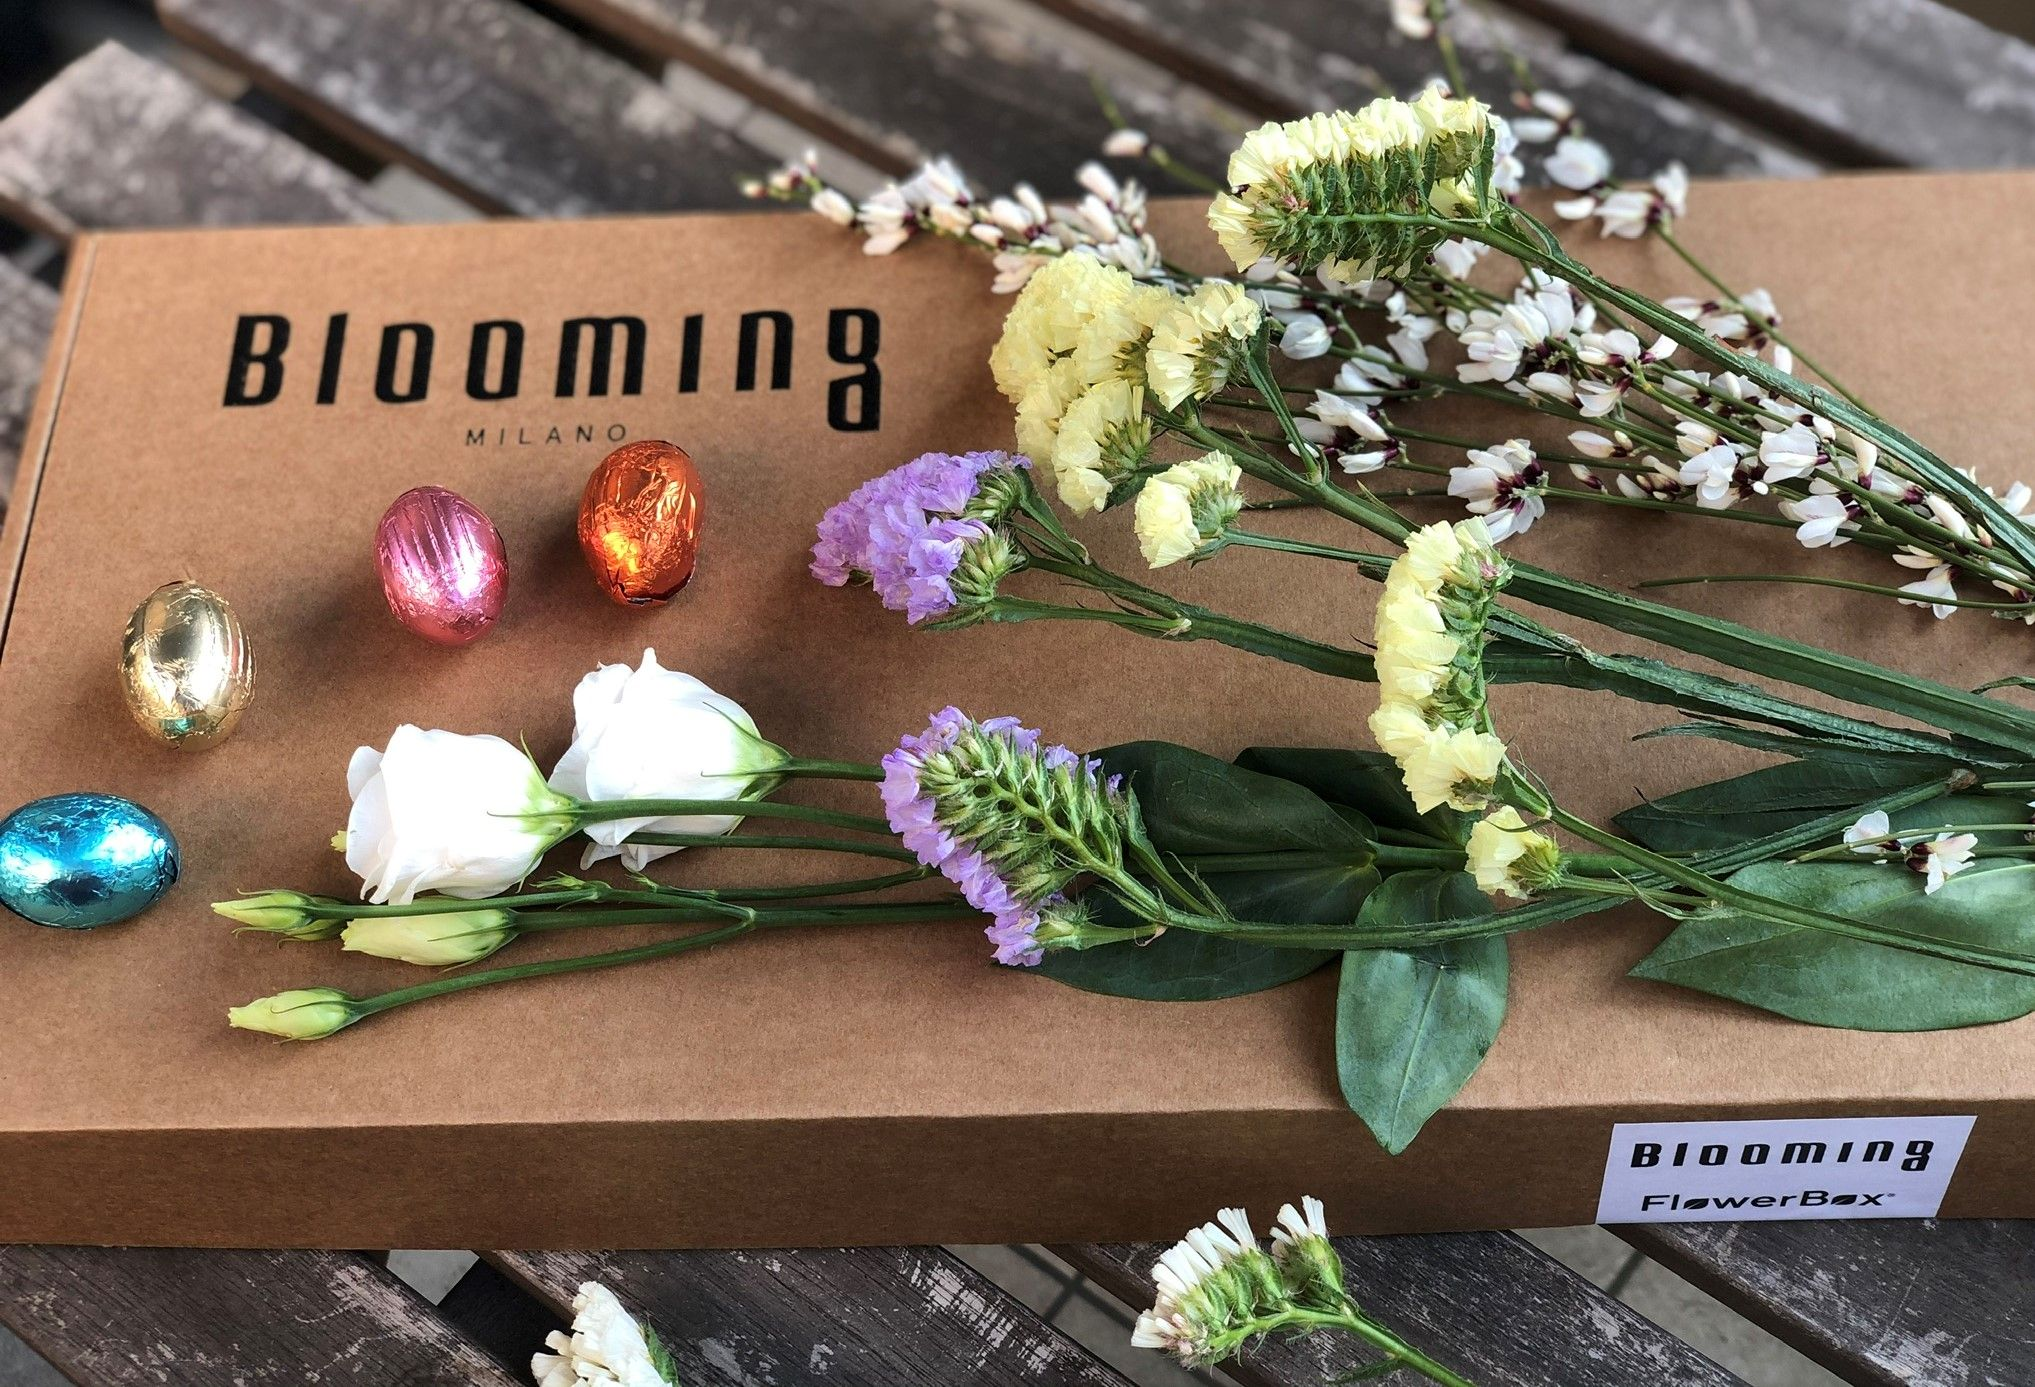 flowerbox pasquale blooming